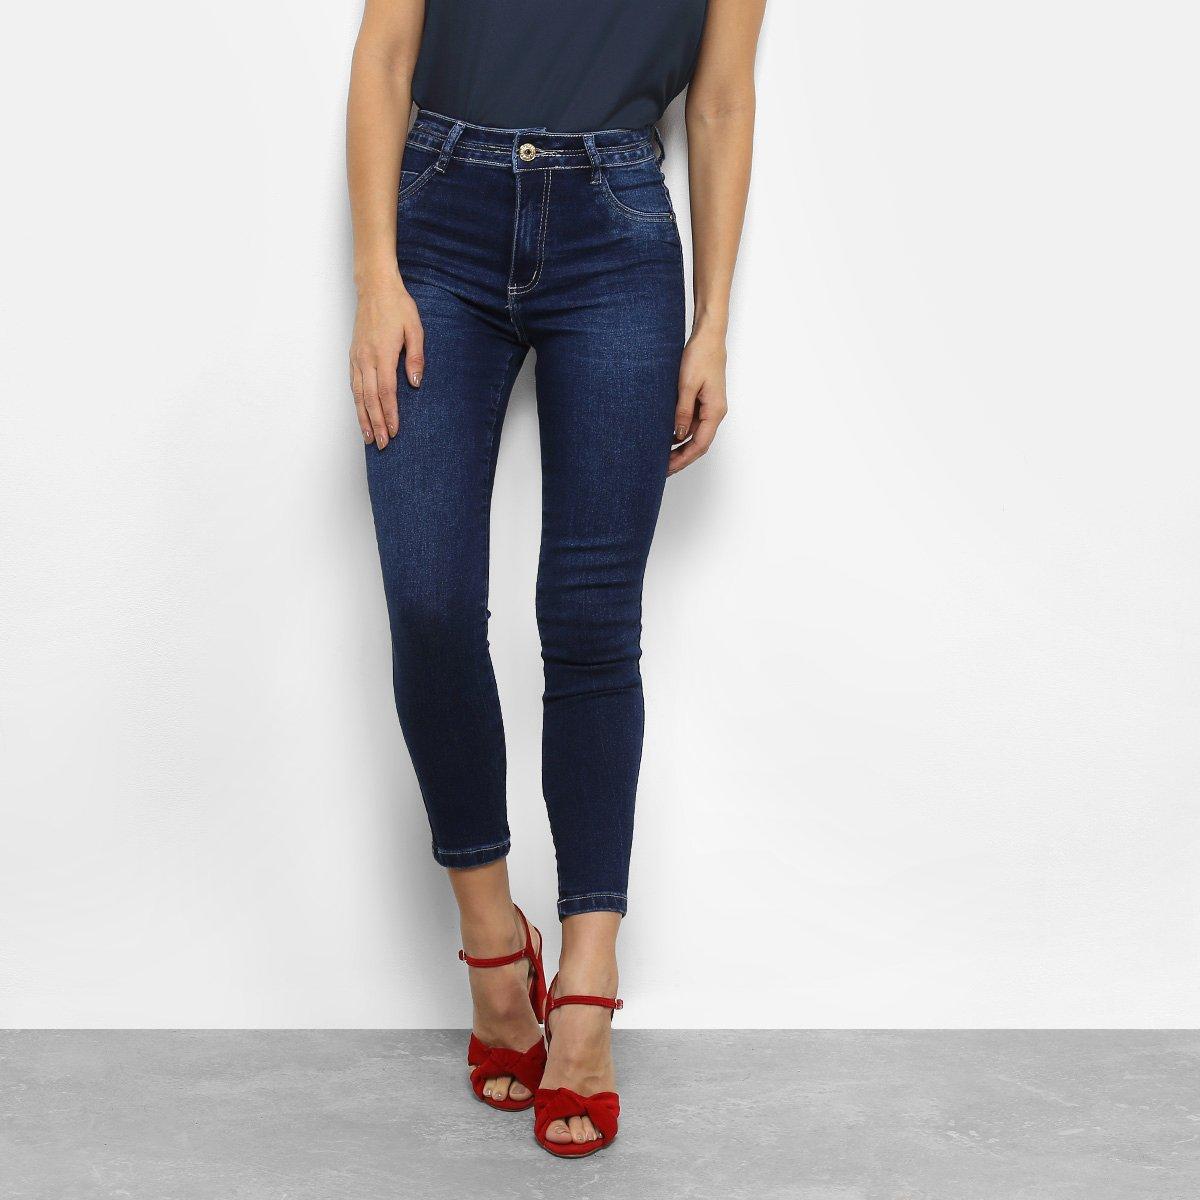 Calça Alta Calça Capri Jeans Cintura Biotipo Feminina Azul Jeans ZqZn5aS